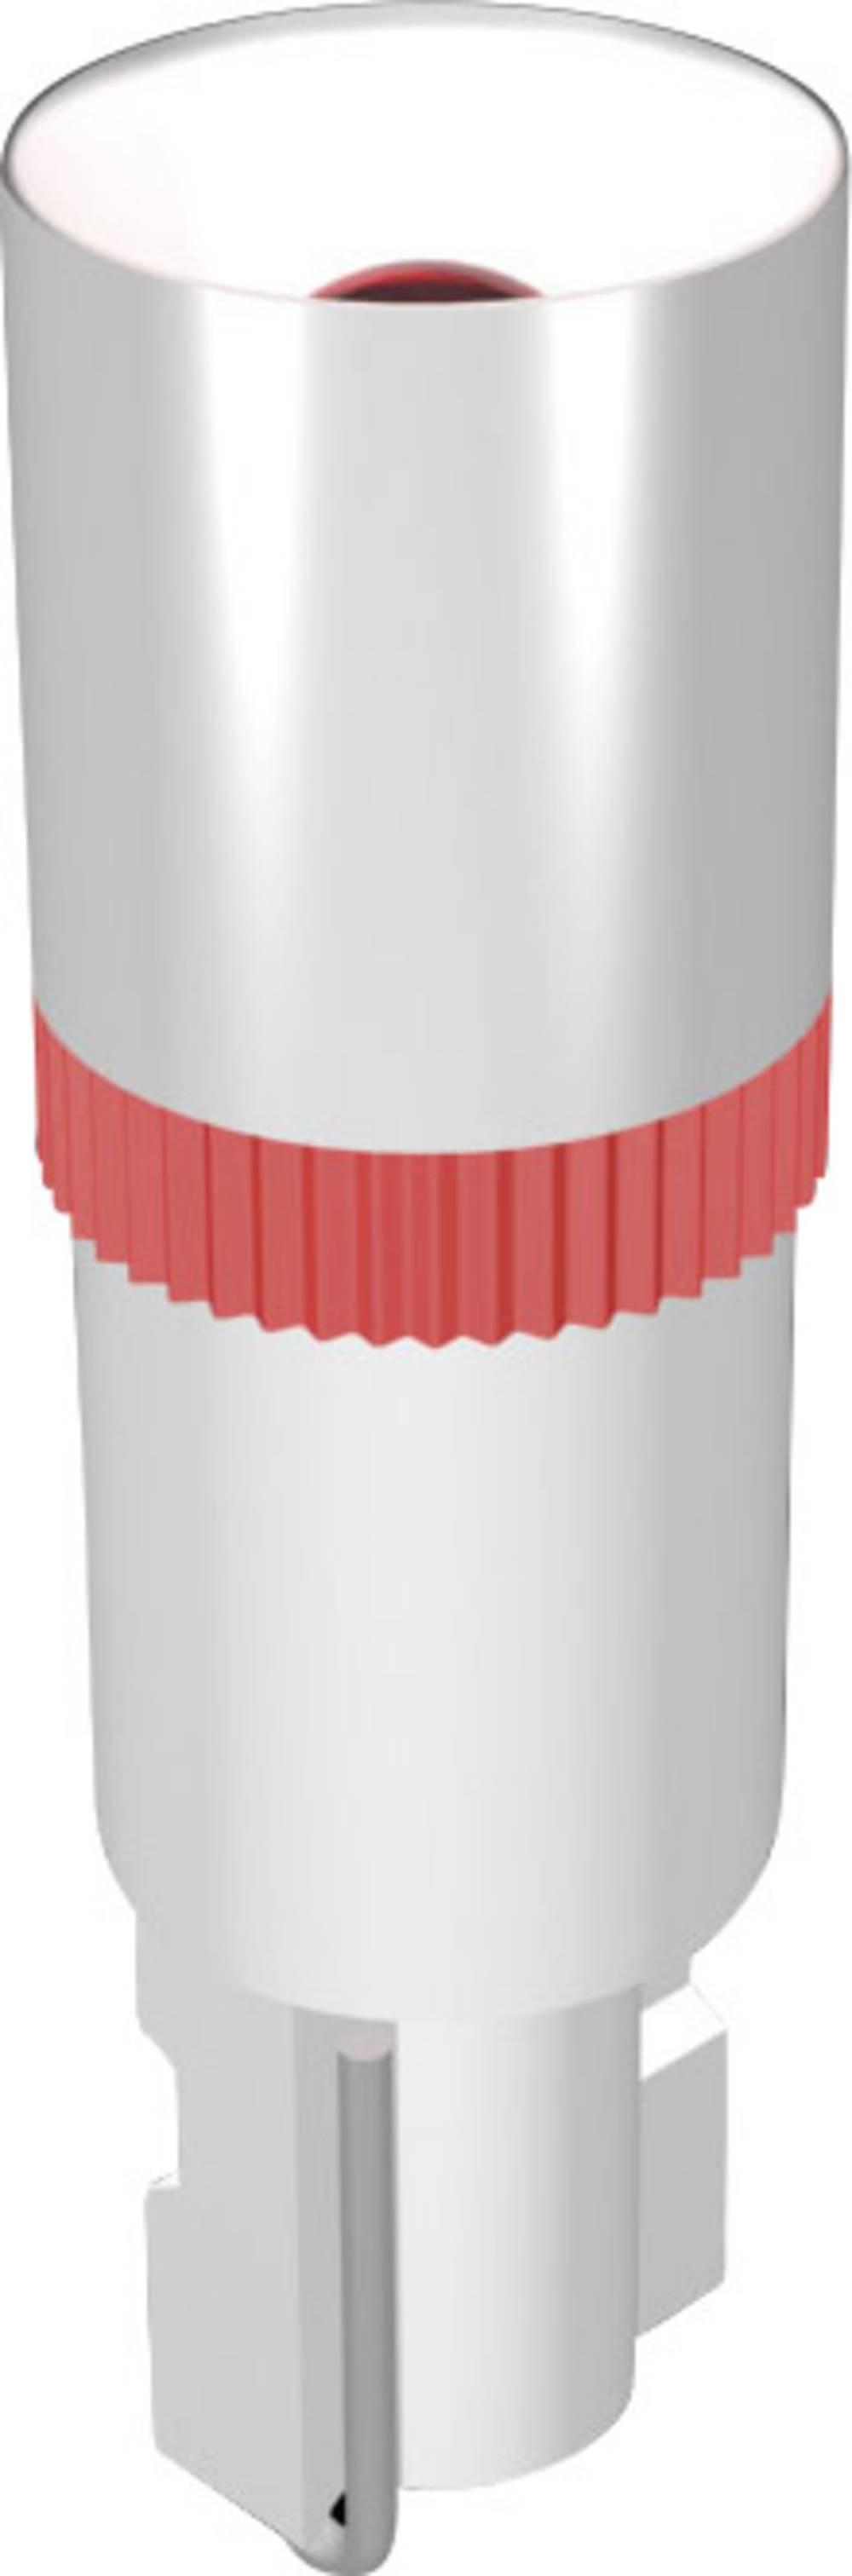 LED-diode Signal Construct W2 x 4,6d MEDW 12 V/DC 50 mcd Orange